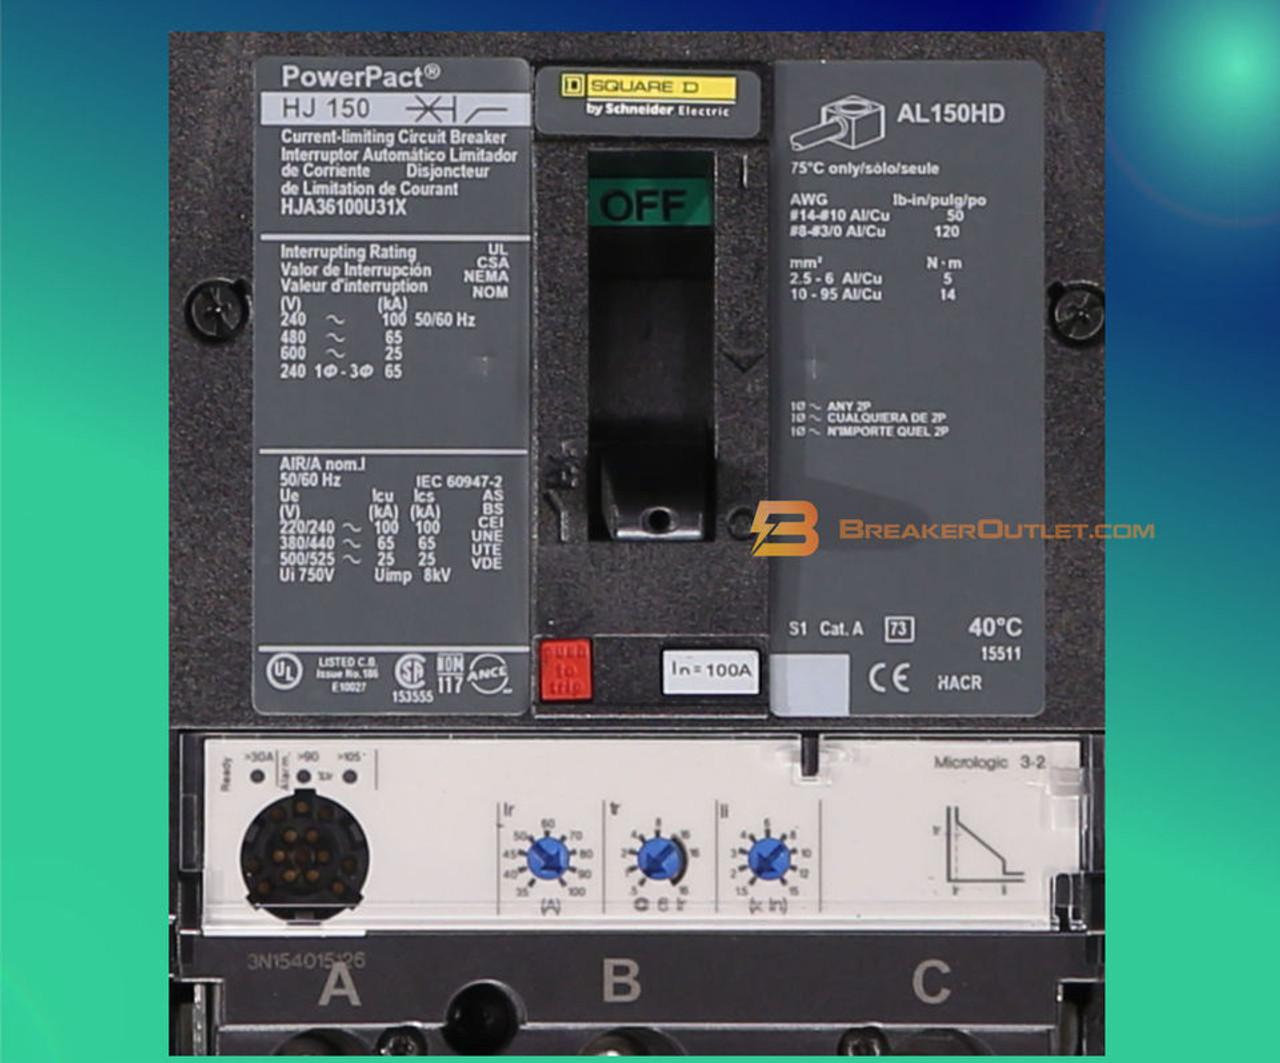 Tags and Adjustment Panel